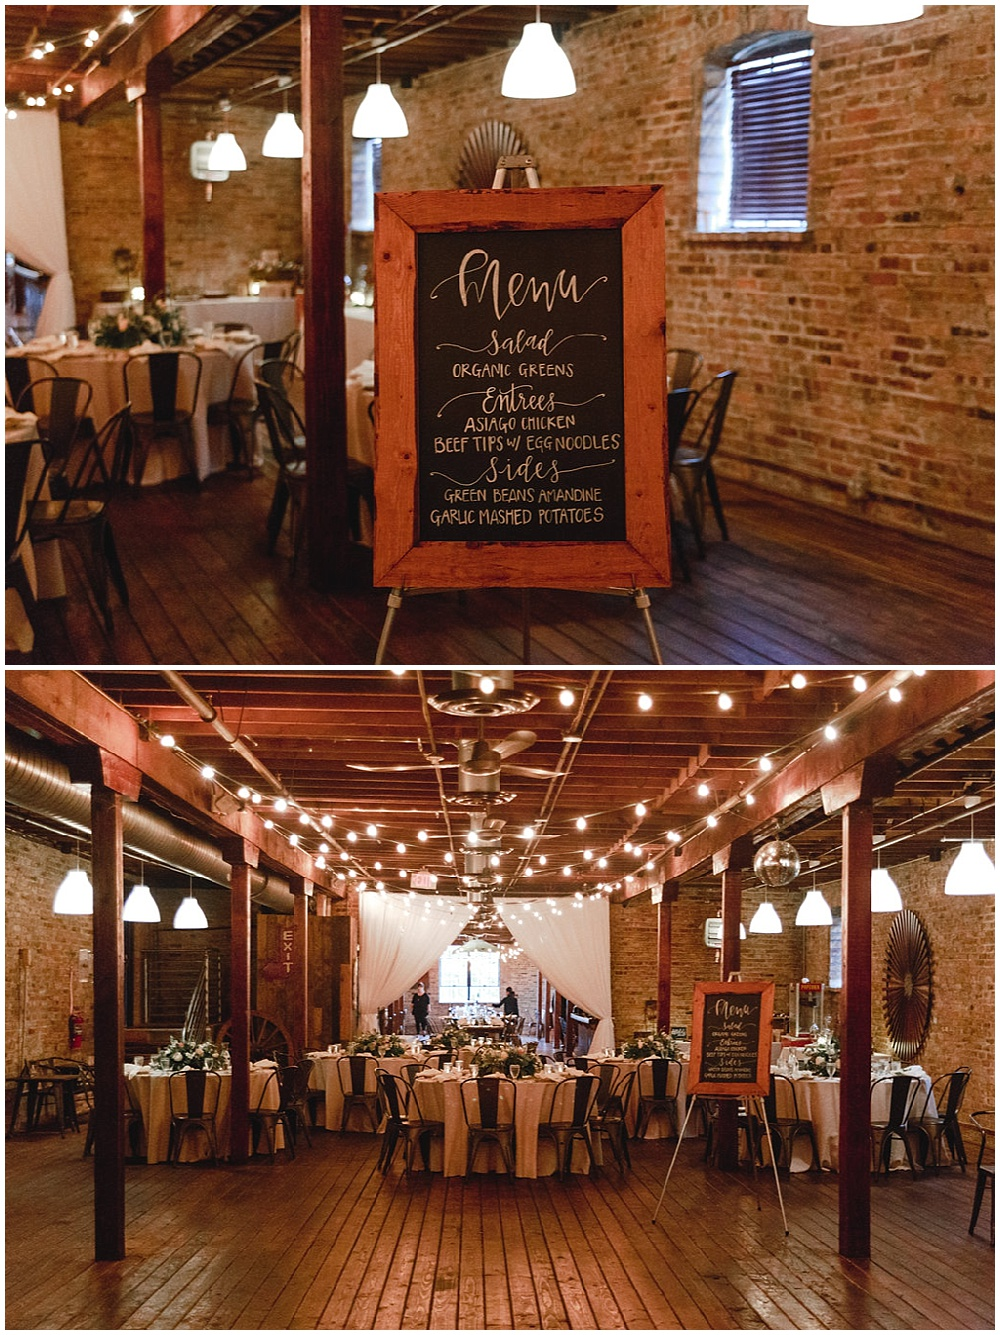 wood personalized menu sign   Chicago urban rustic wedding  Sandra Armenteros Photography   Jessica Dum Wedding Coordination